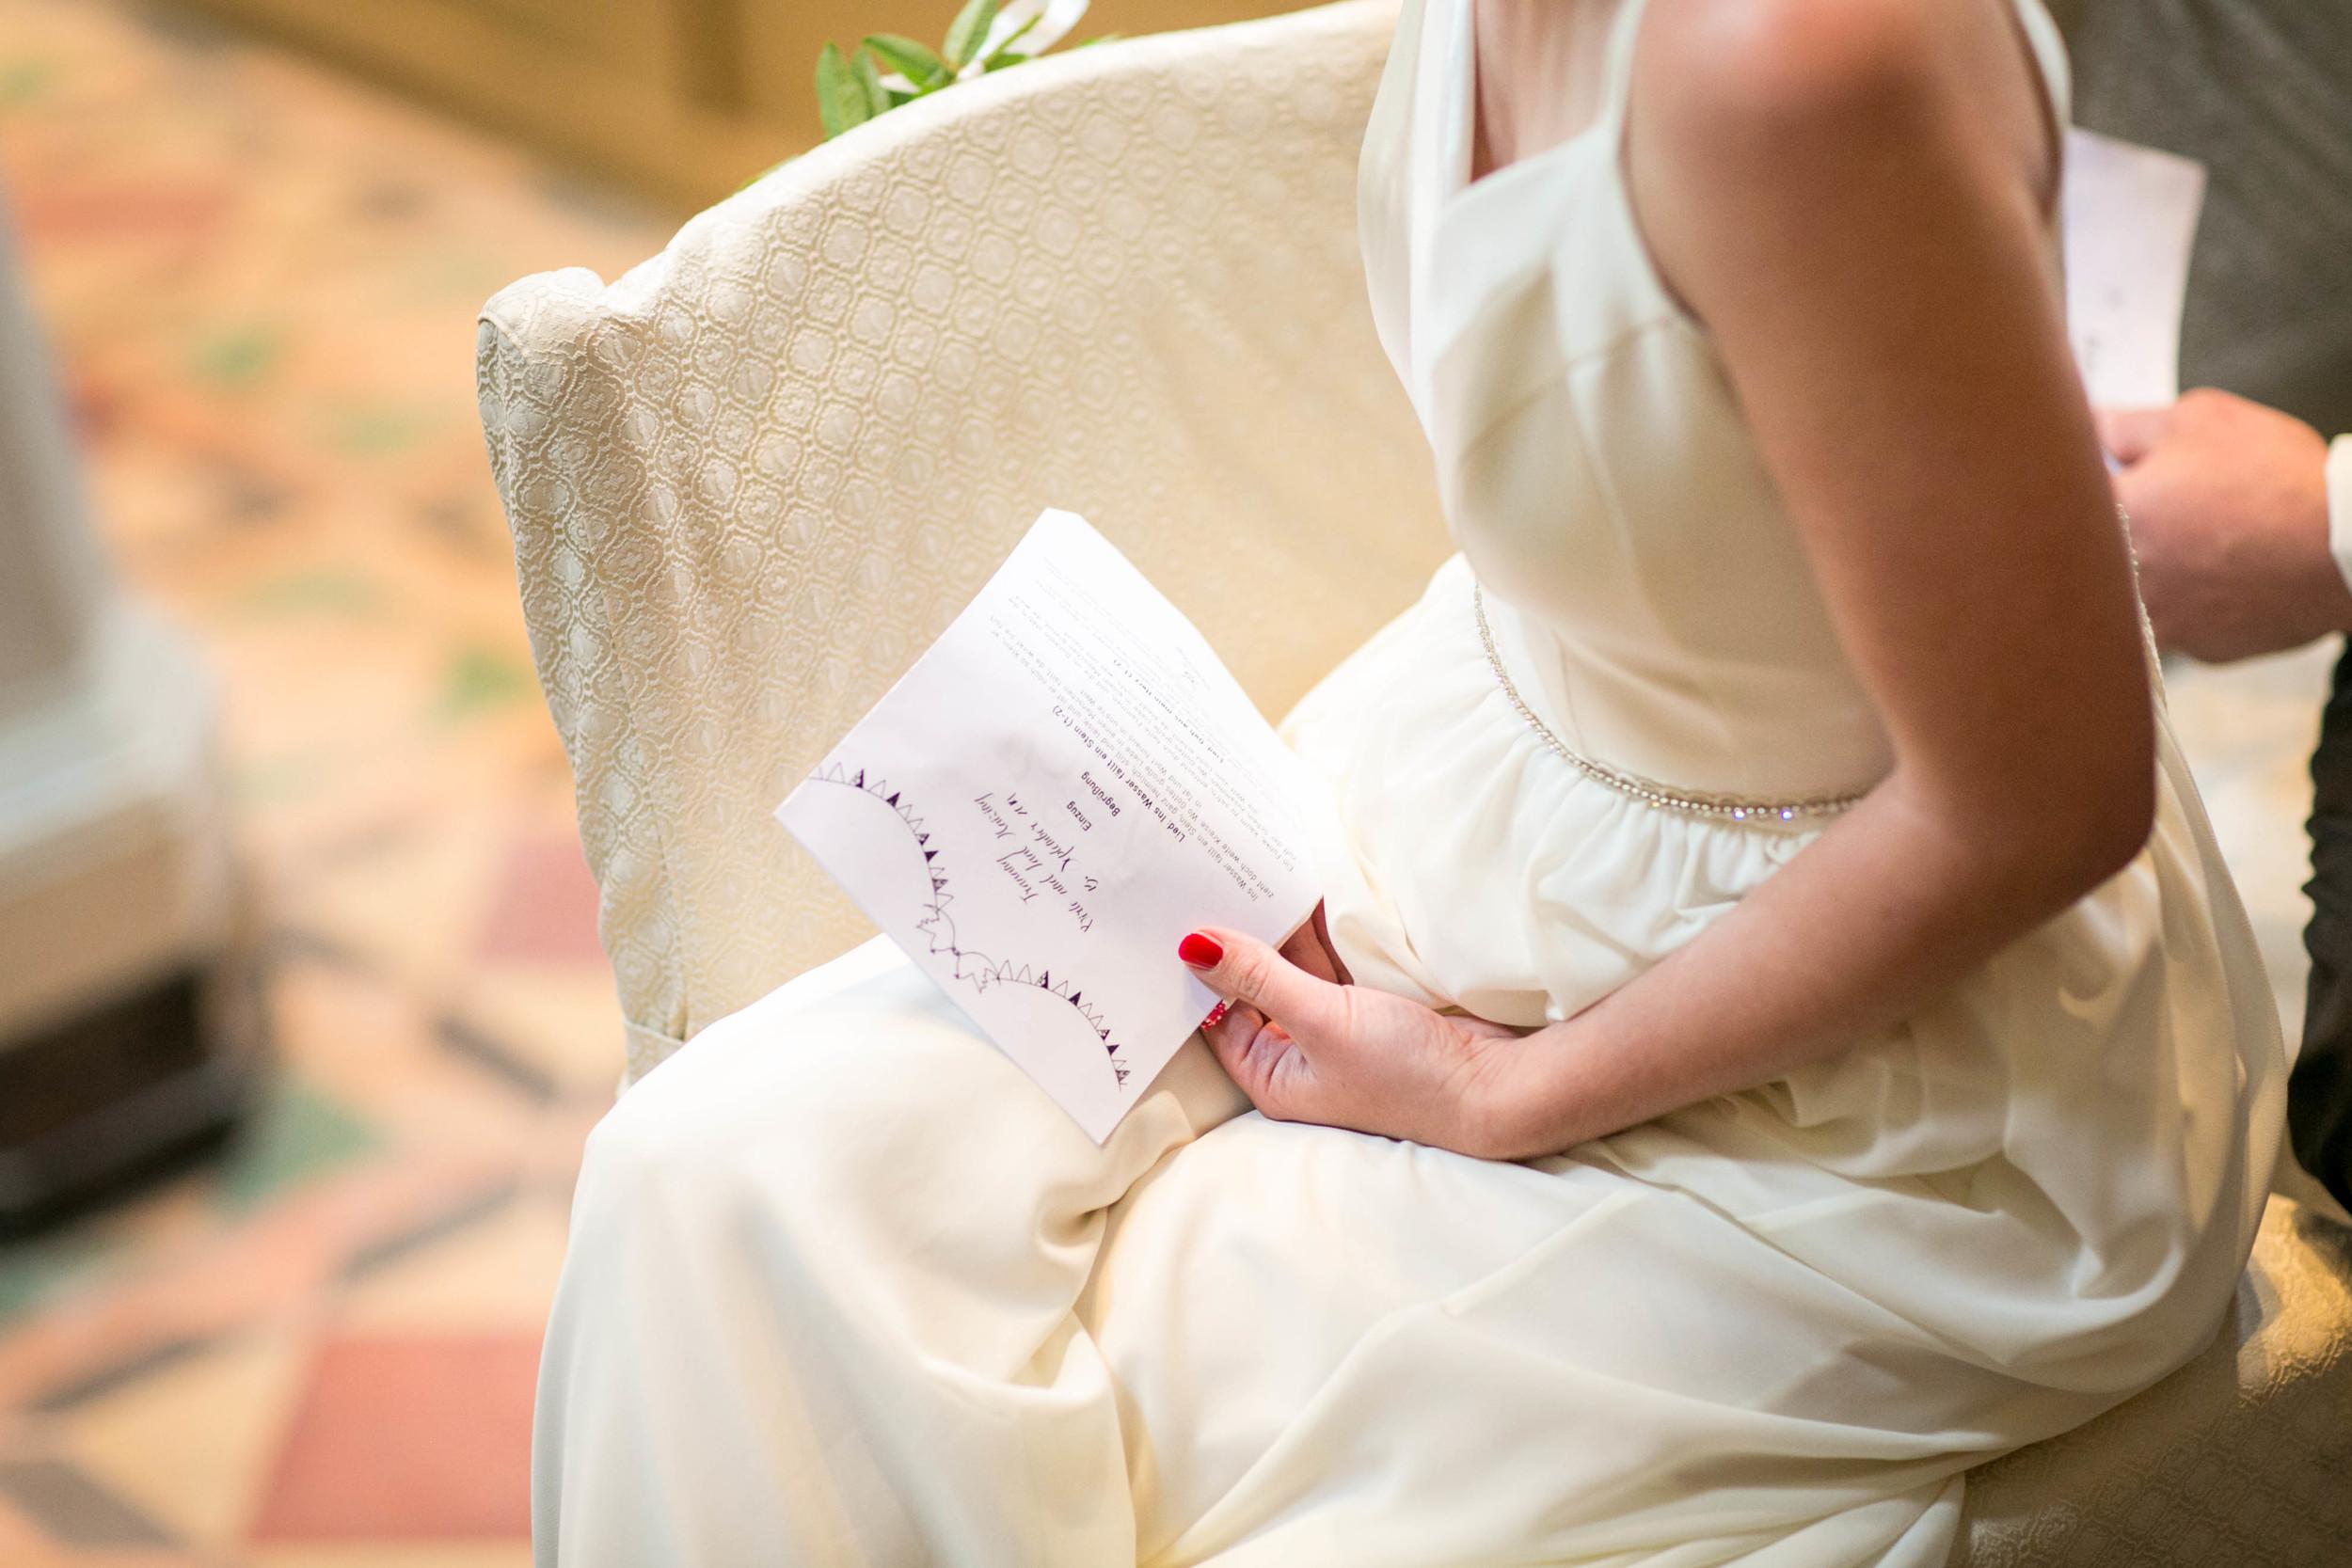 Michelberger Hotel Berlin Hochzeitsfotografie_Fran Burrows Fotografie-30.jpg